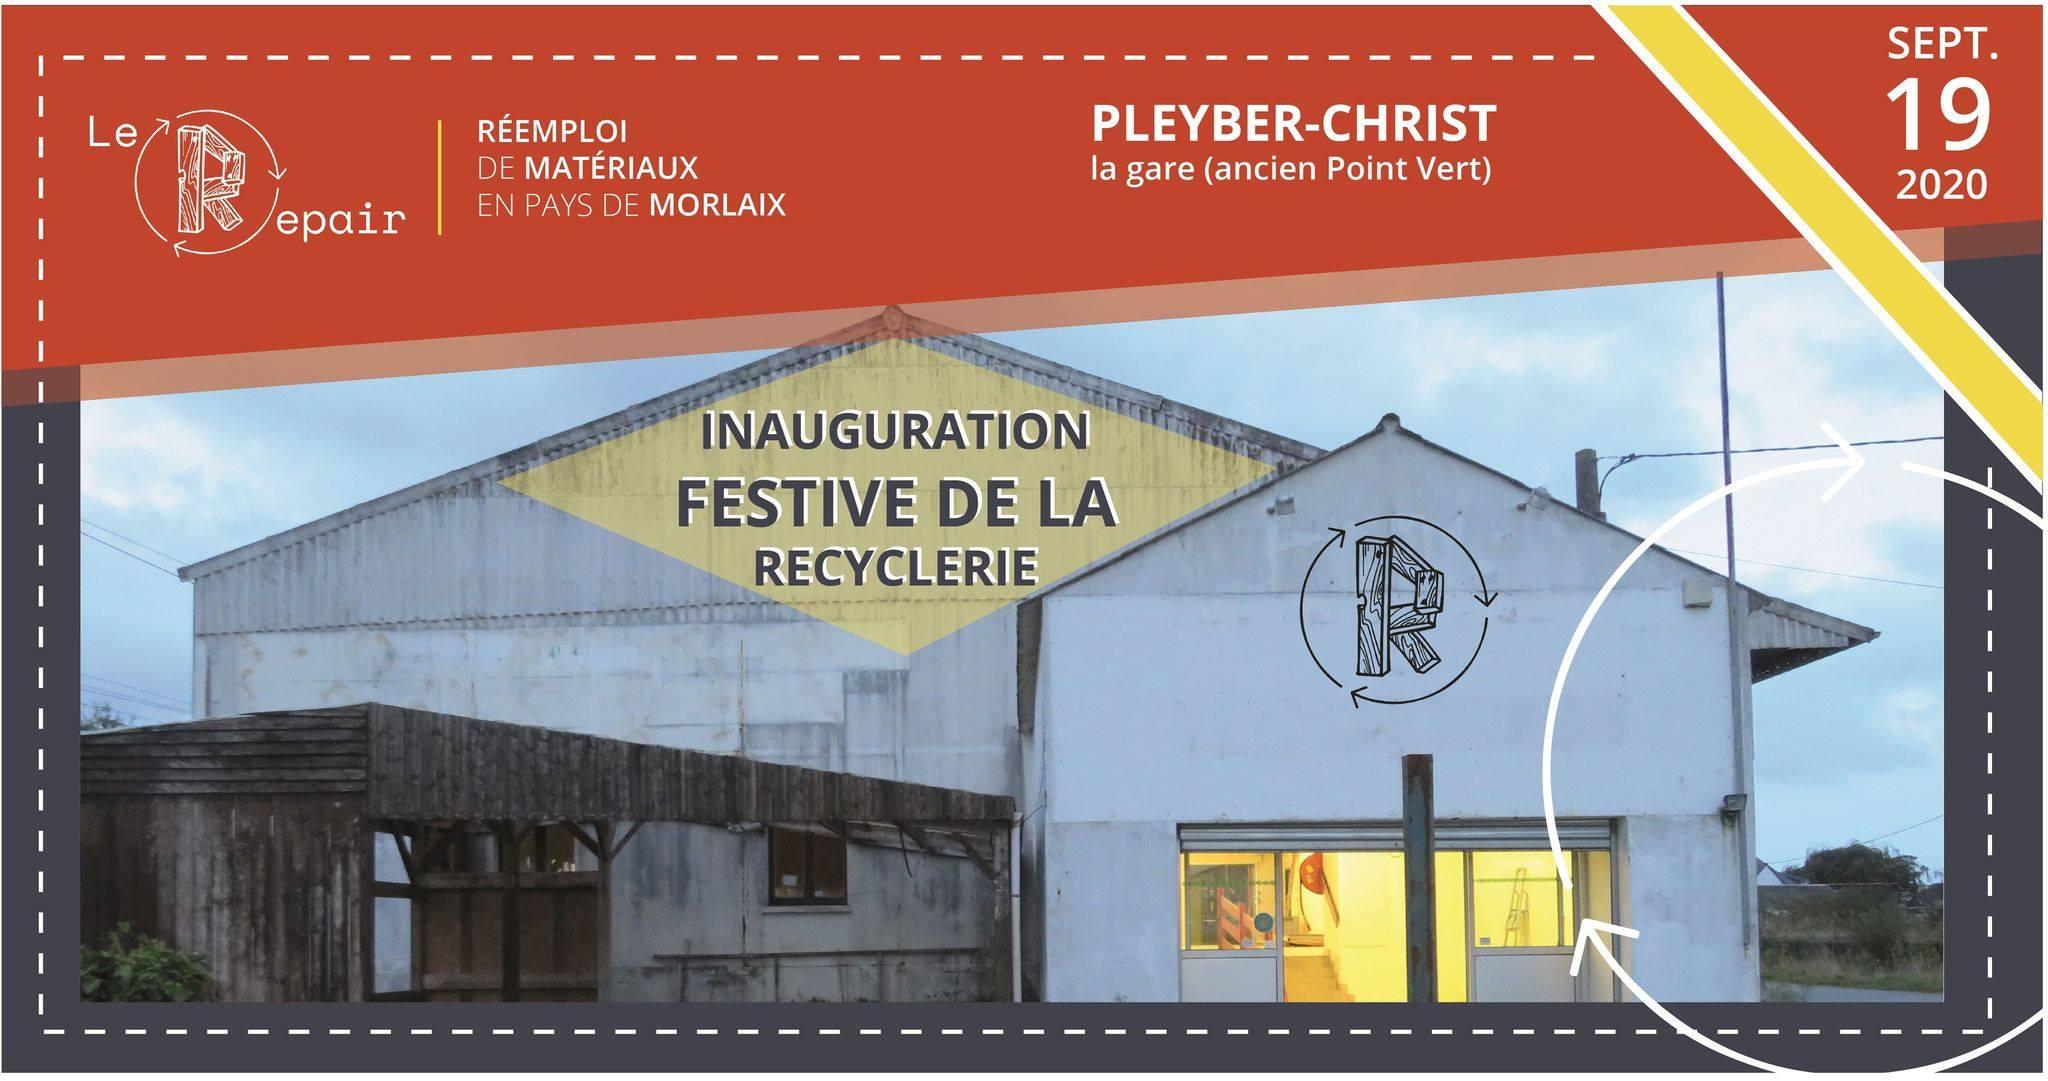 Pleyber-Christ (29), Inauguration festive du Repair